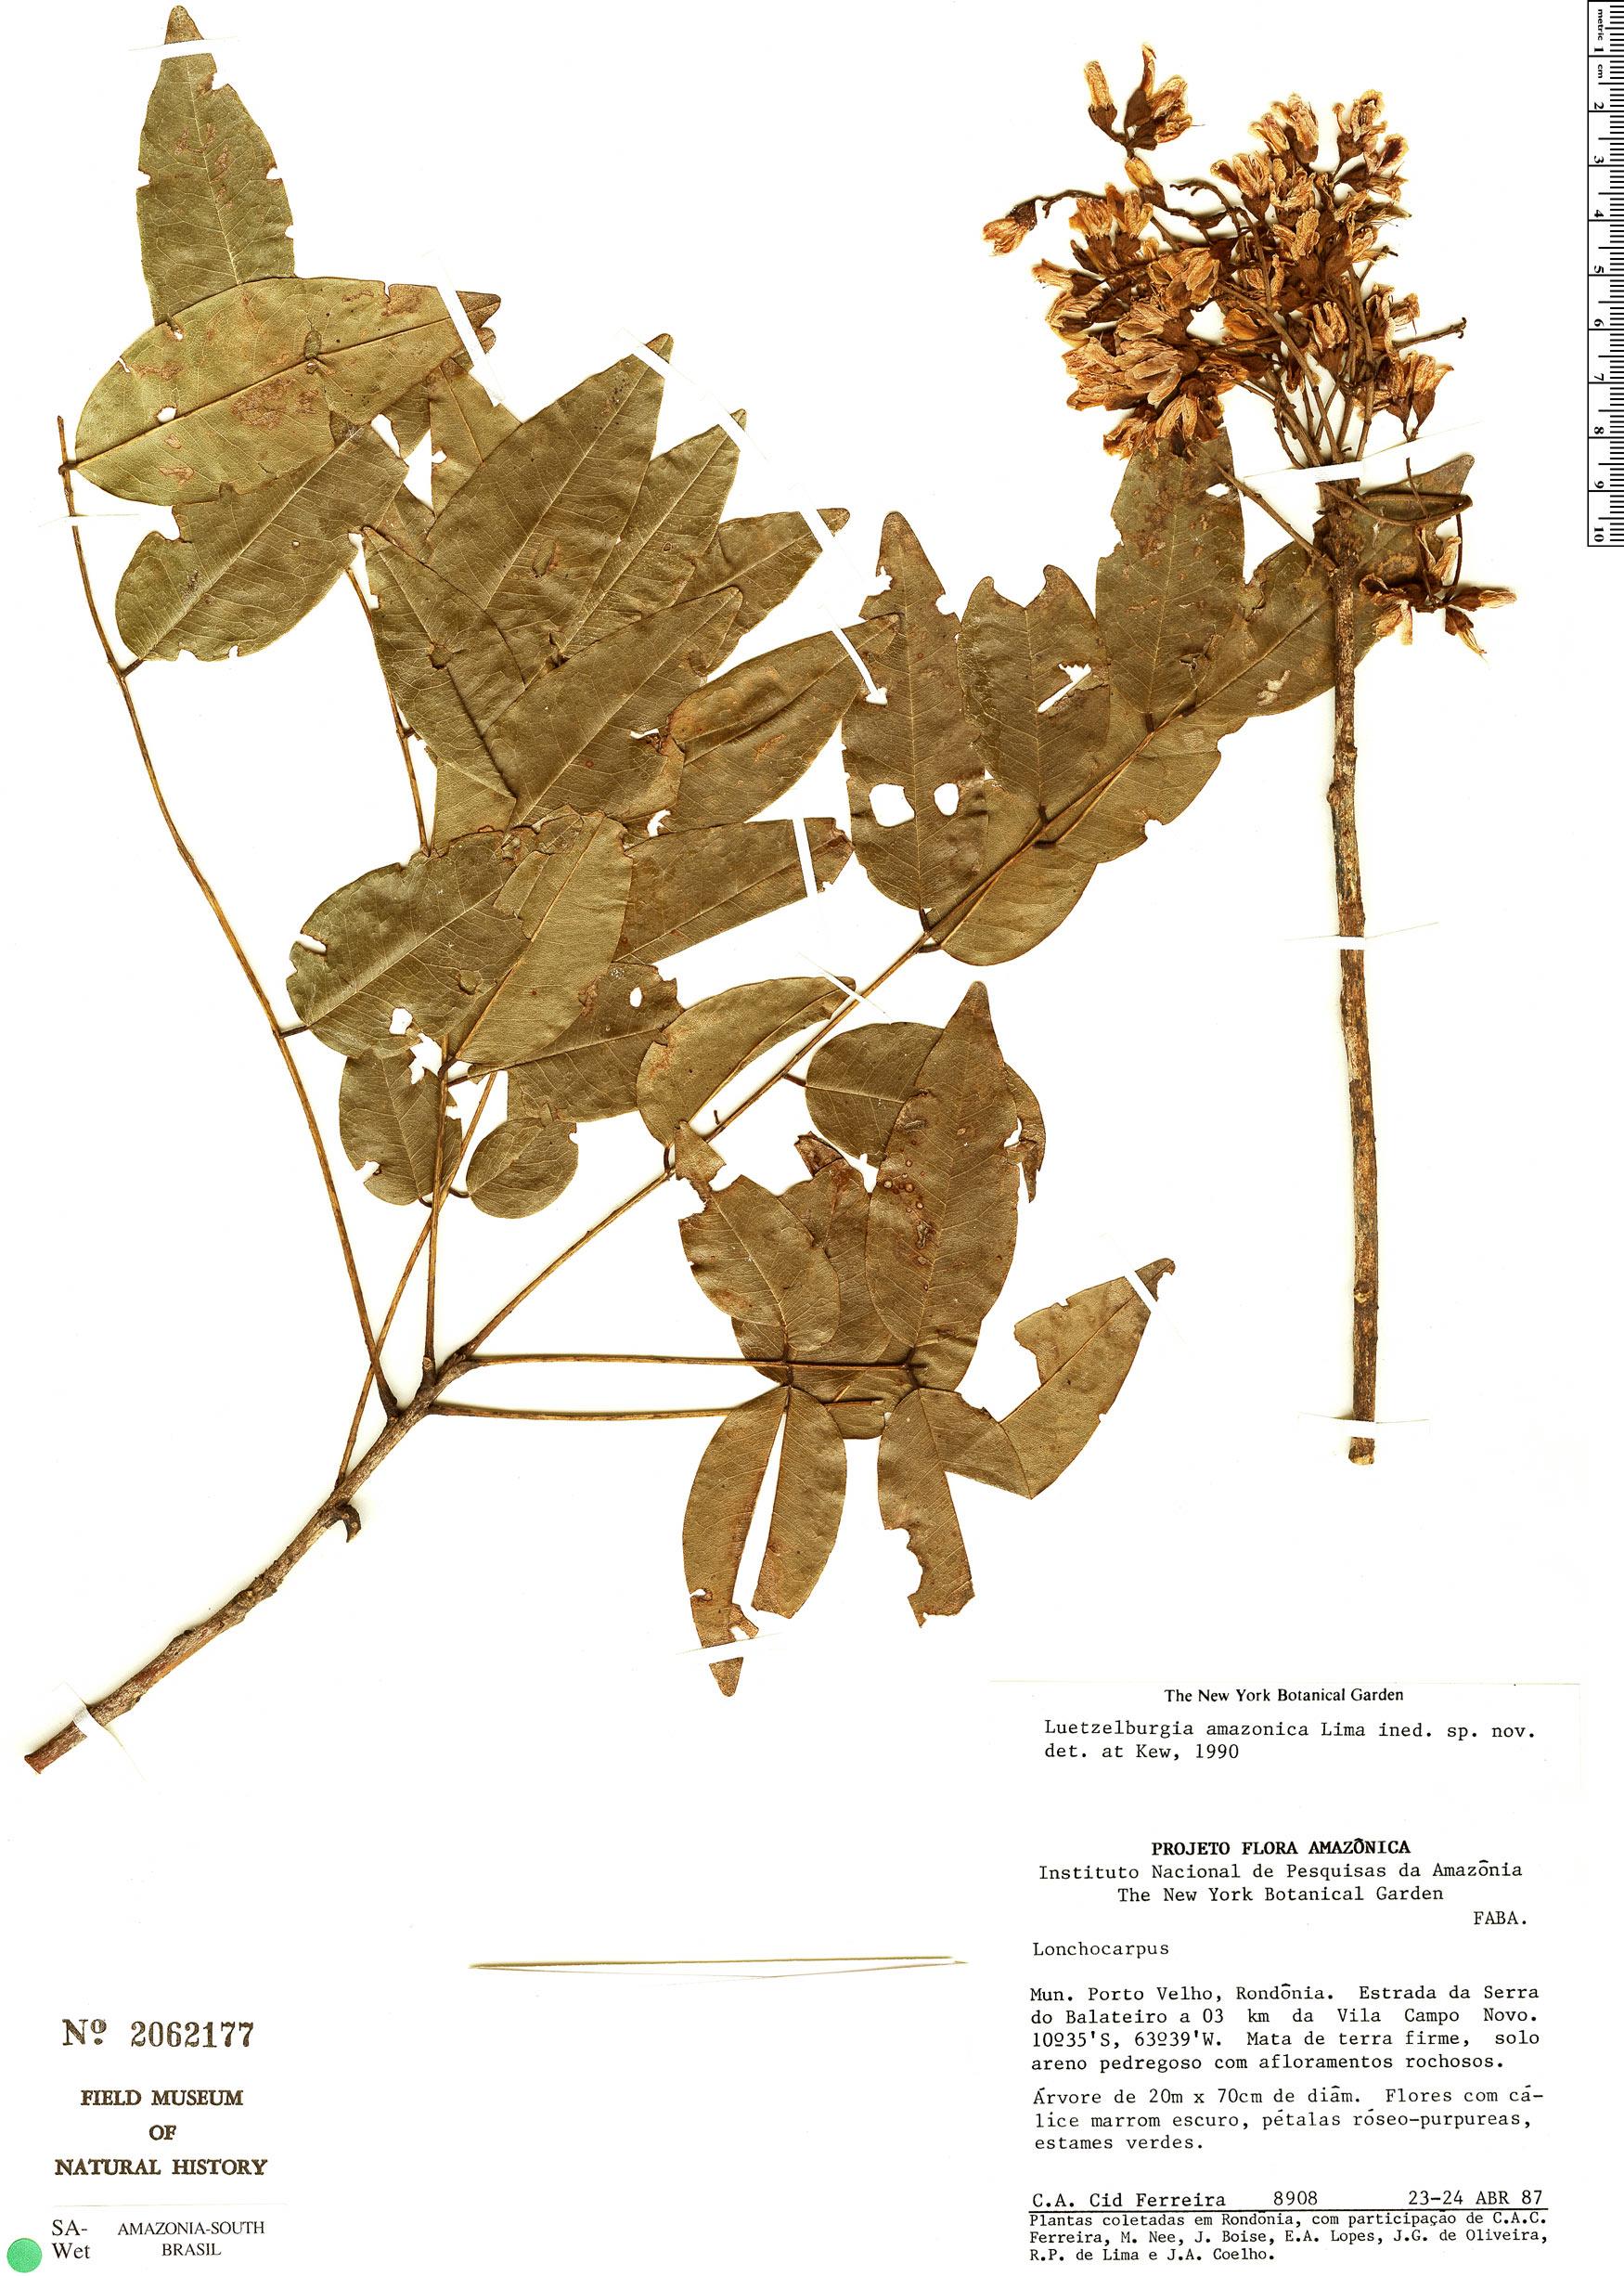 Specimen: Luetzelburgia amazonica